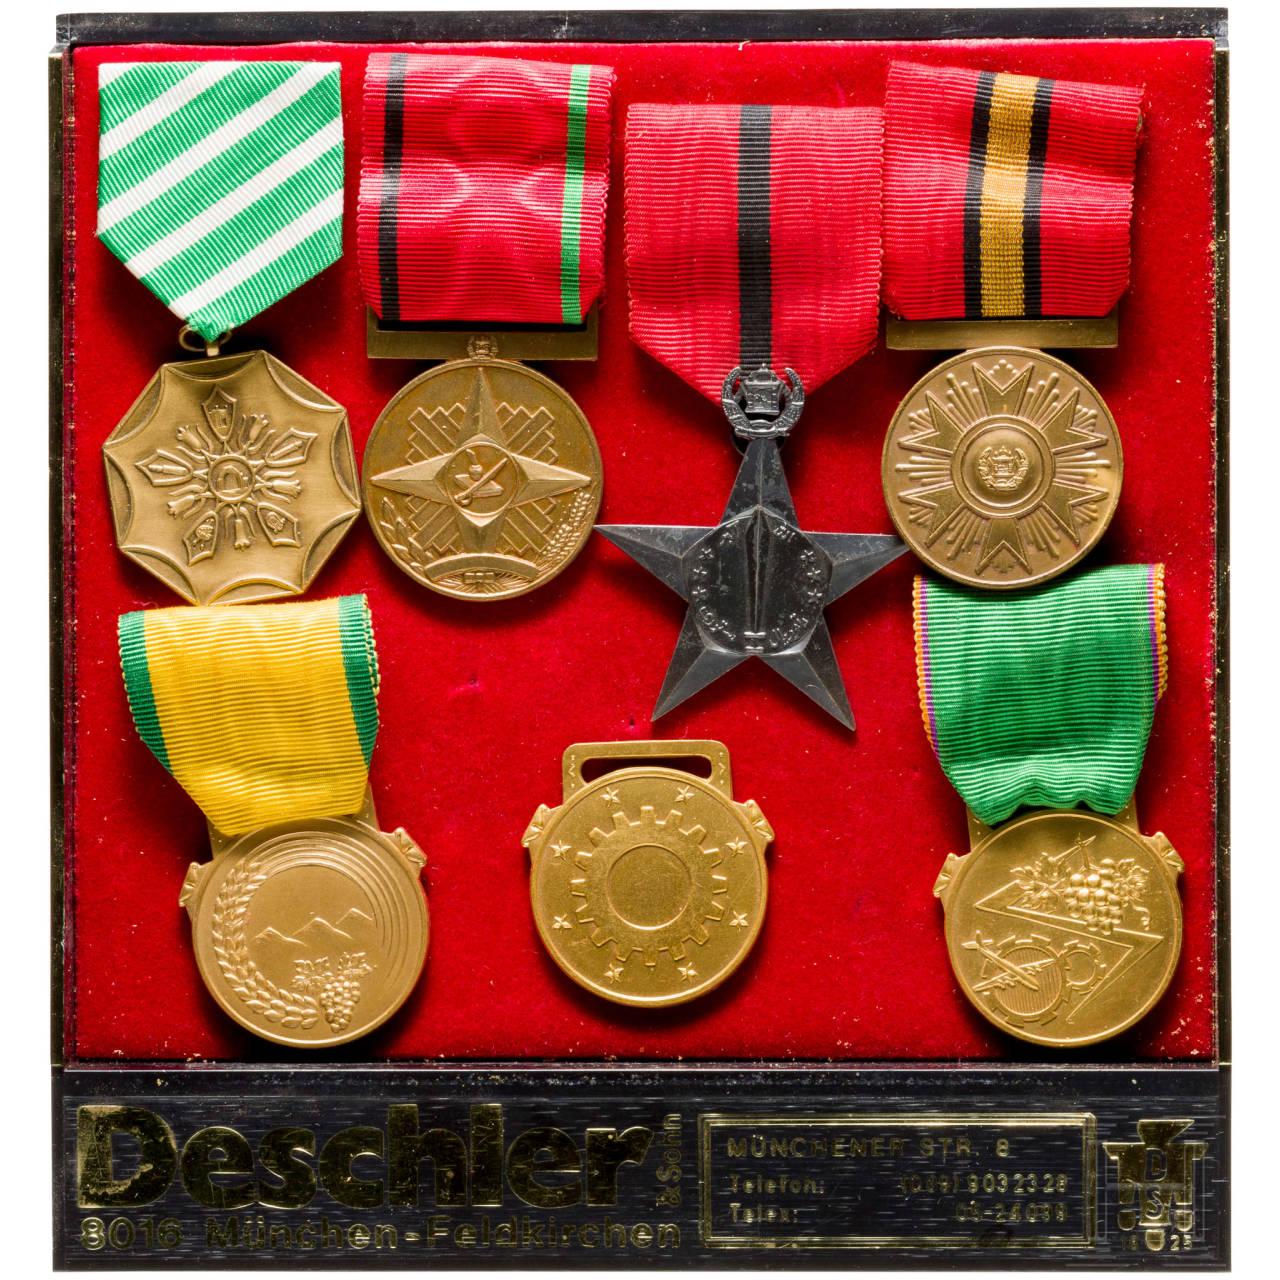 Company Deschler & Sohn, Munich - seven international badges in presentation box, 1970s